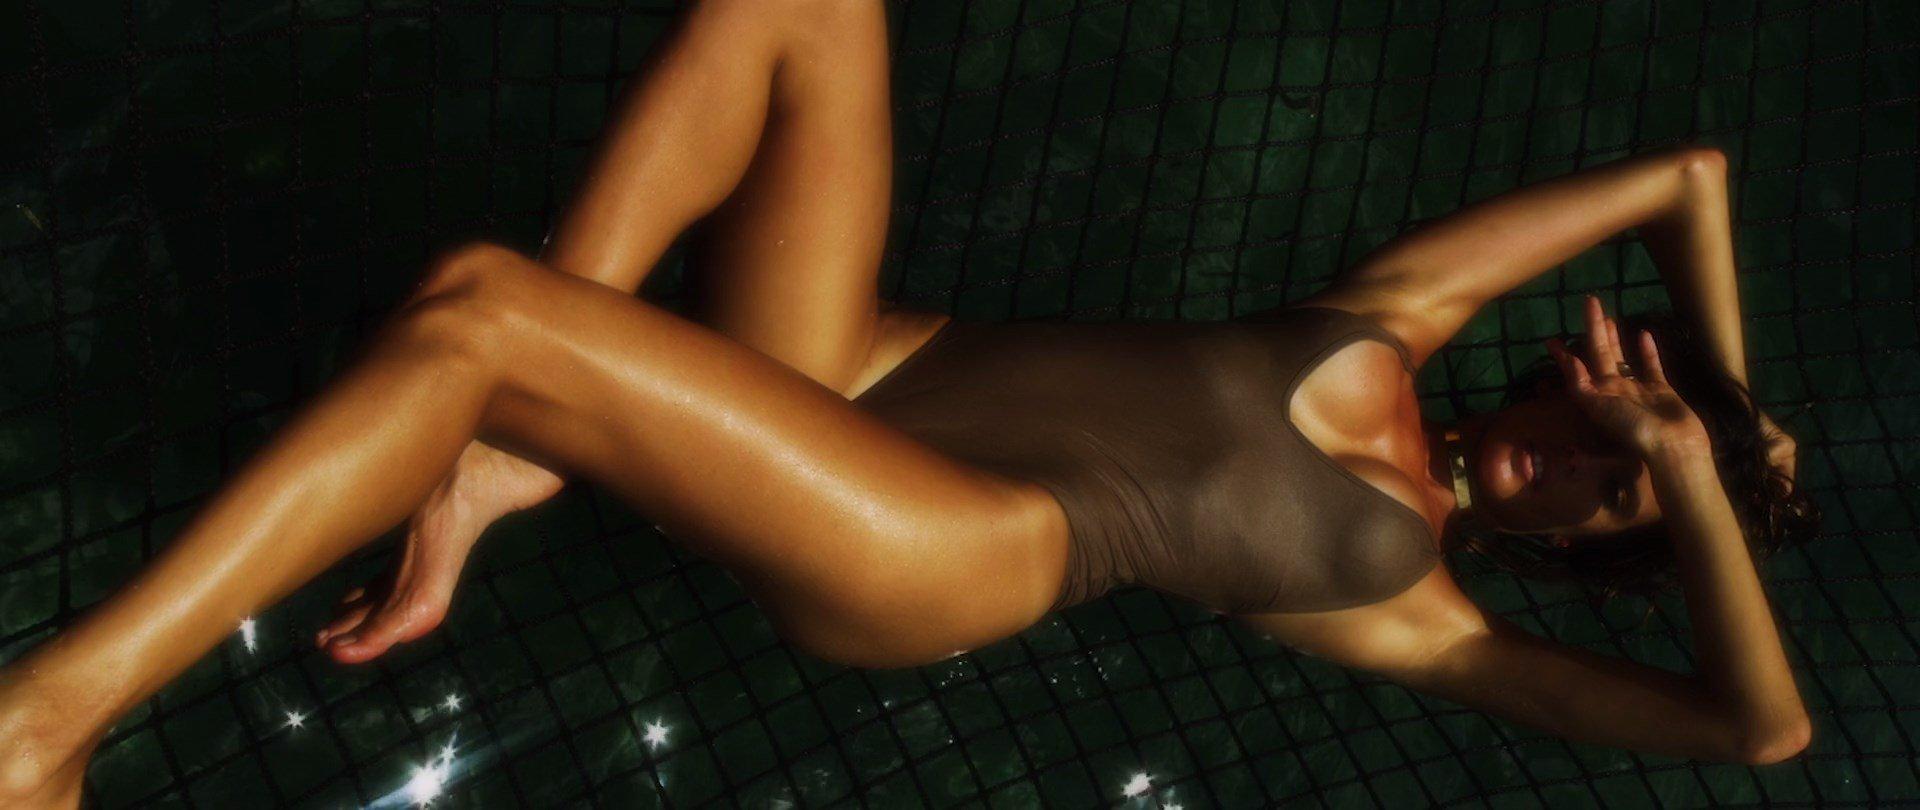 from Taylor sexy alessandra ambrosio naked